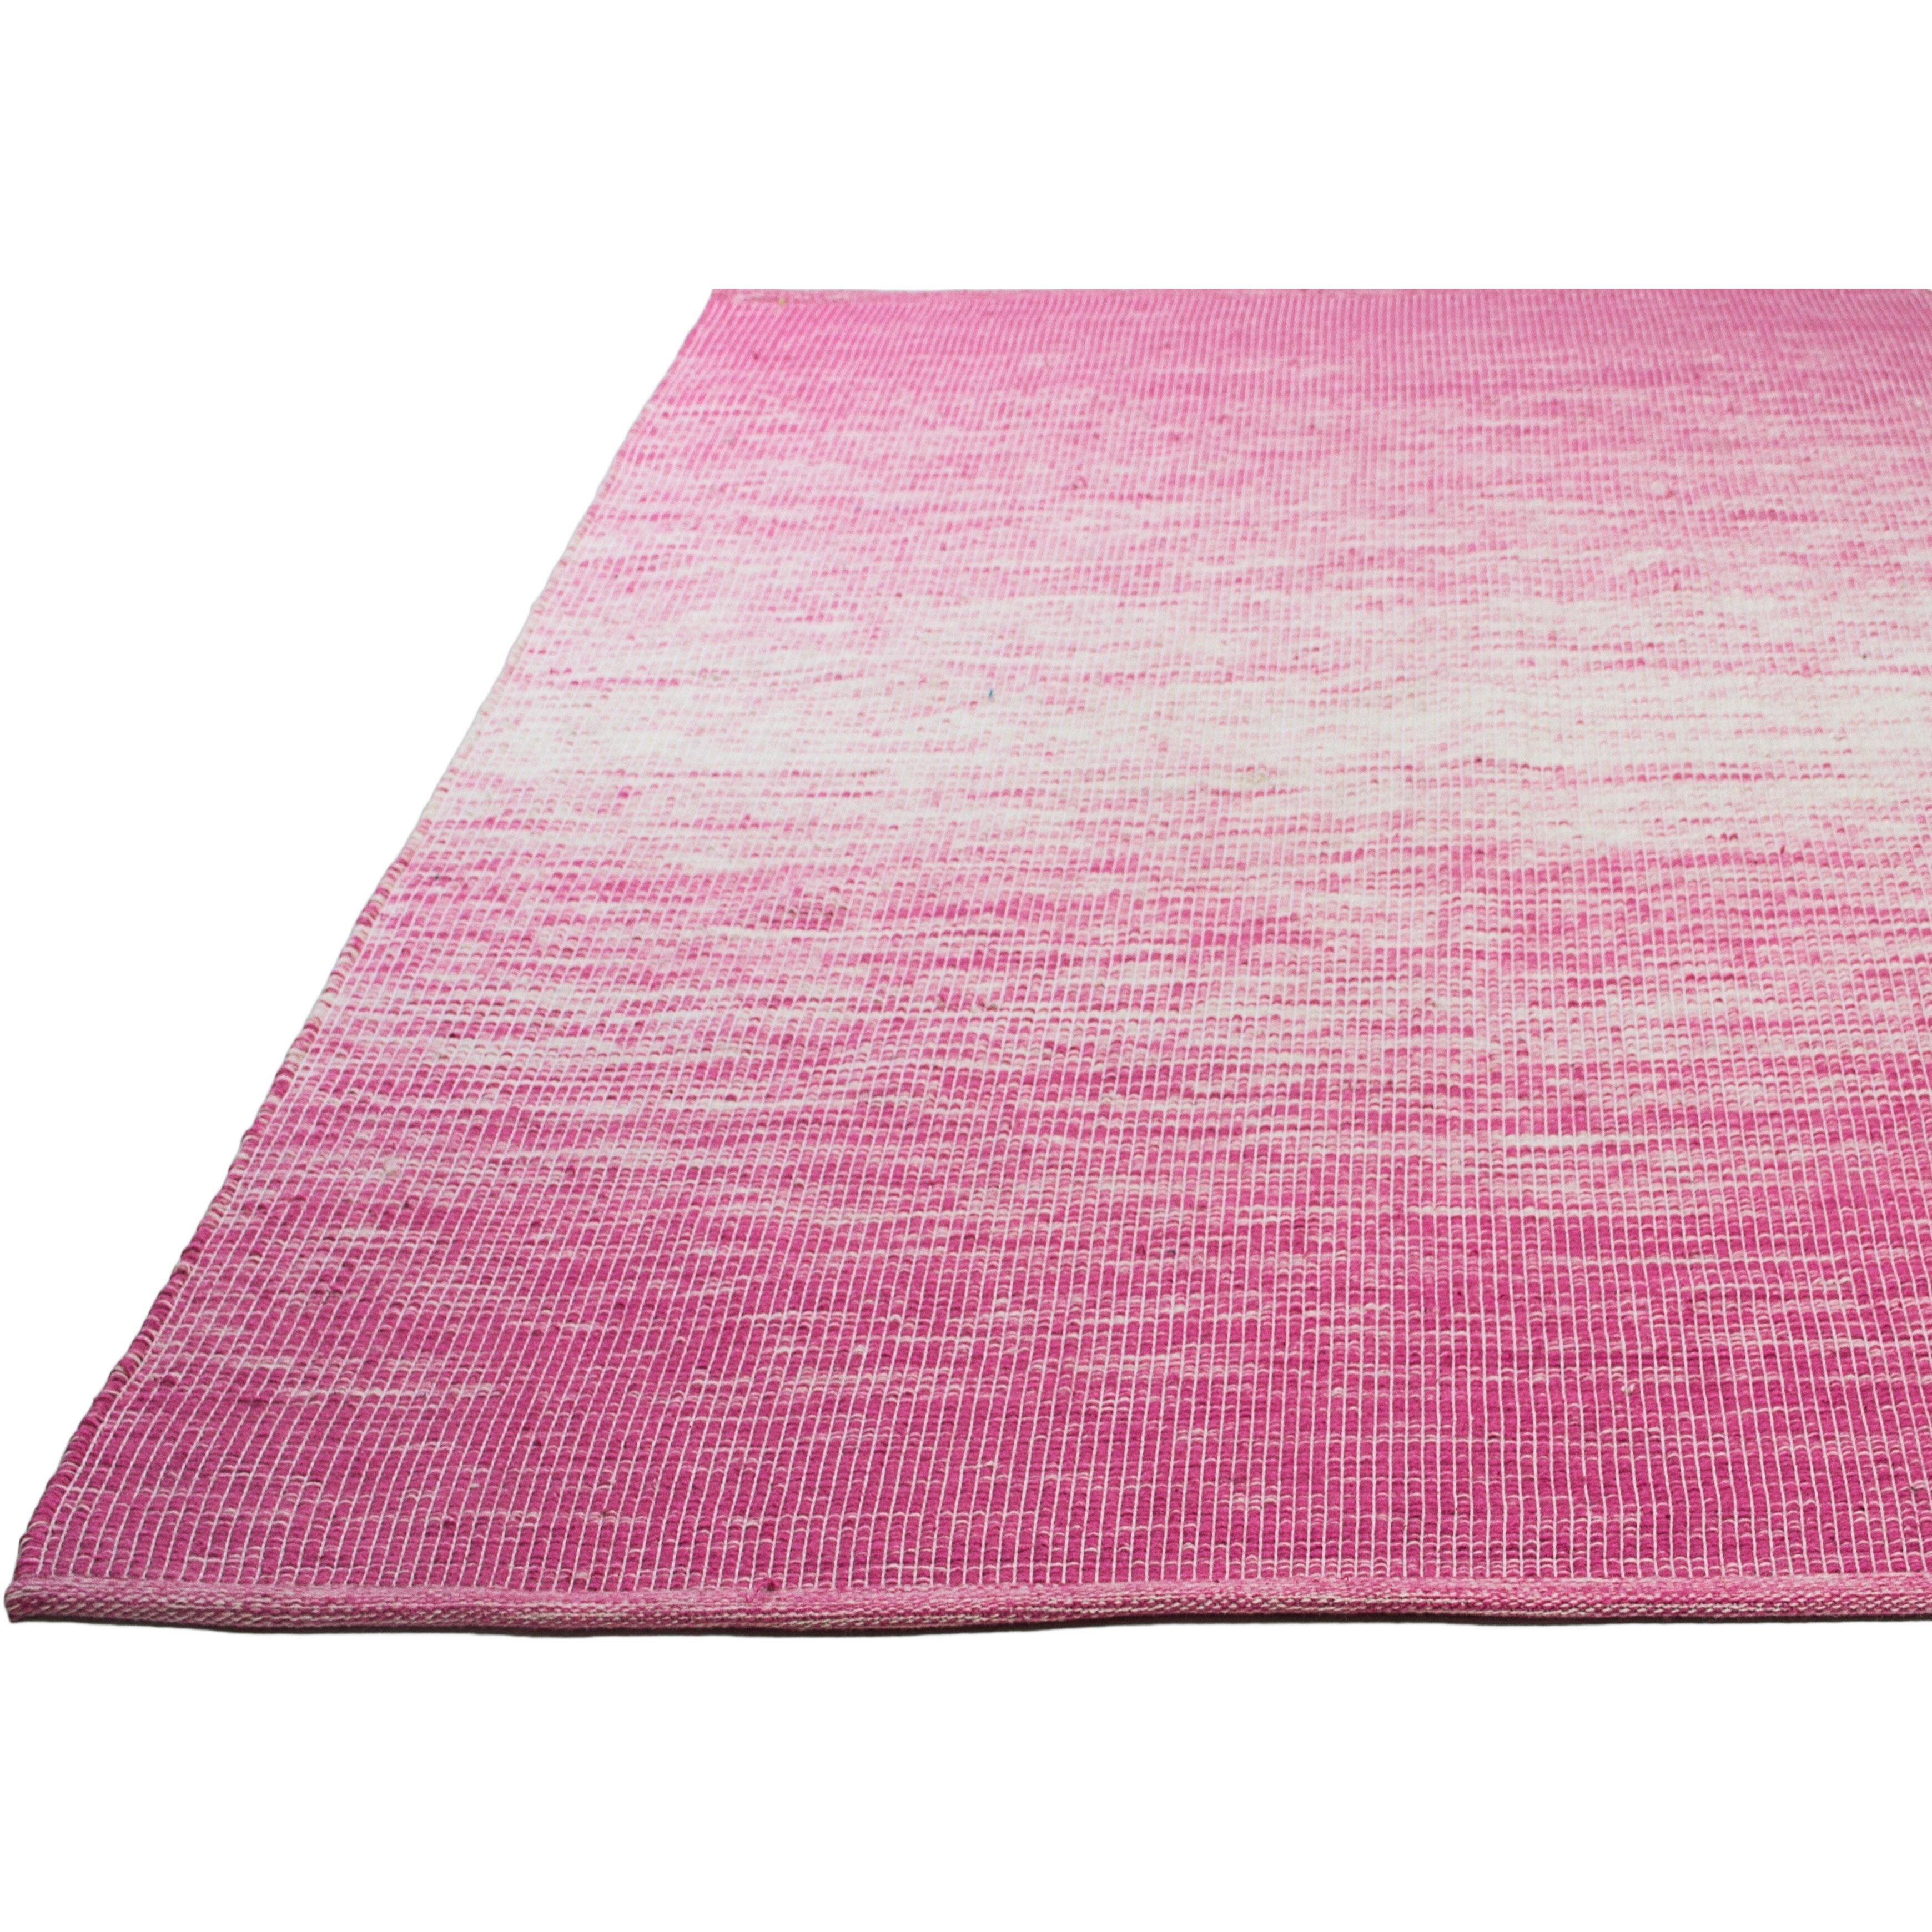 Fab rugs estate hand woven pink indoor outdoor area rug for Landscape indoor area rug